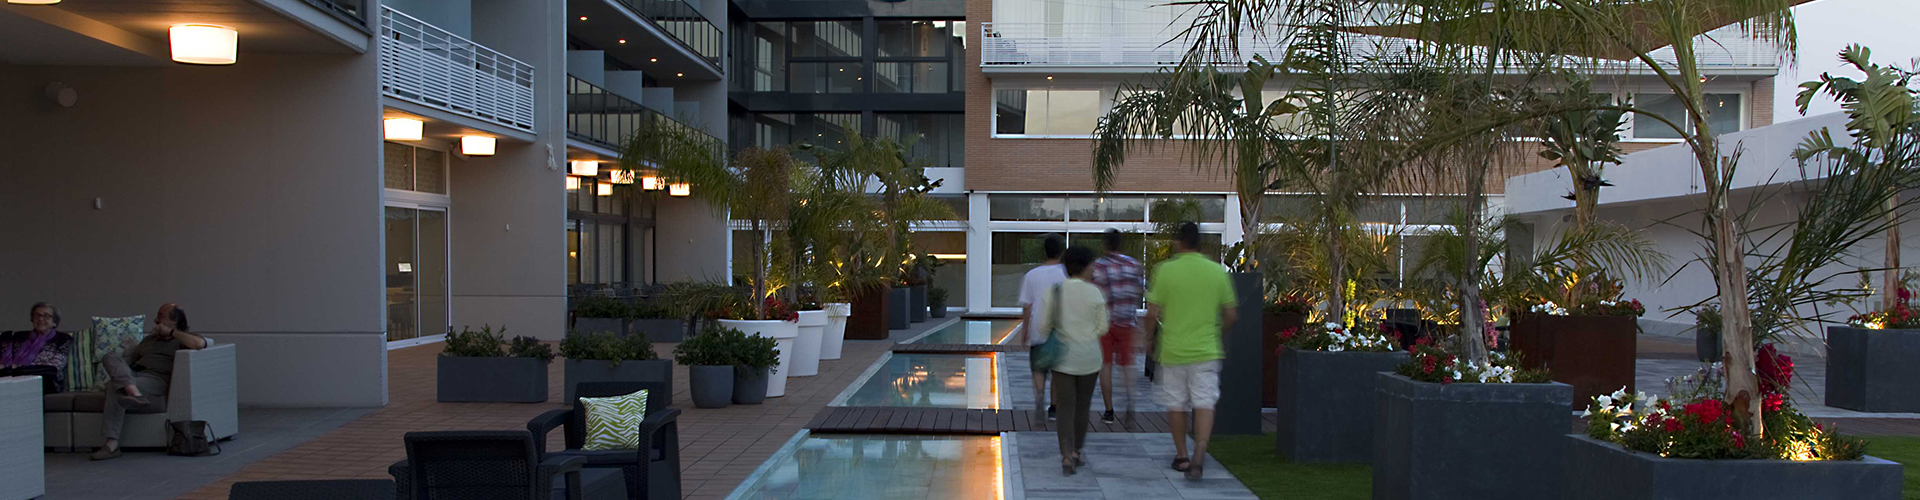 ALTAFULLA MAR HOTEL (3)